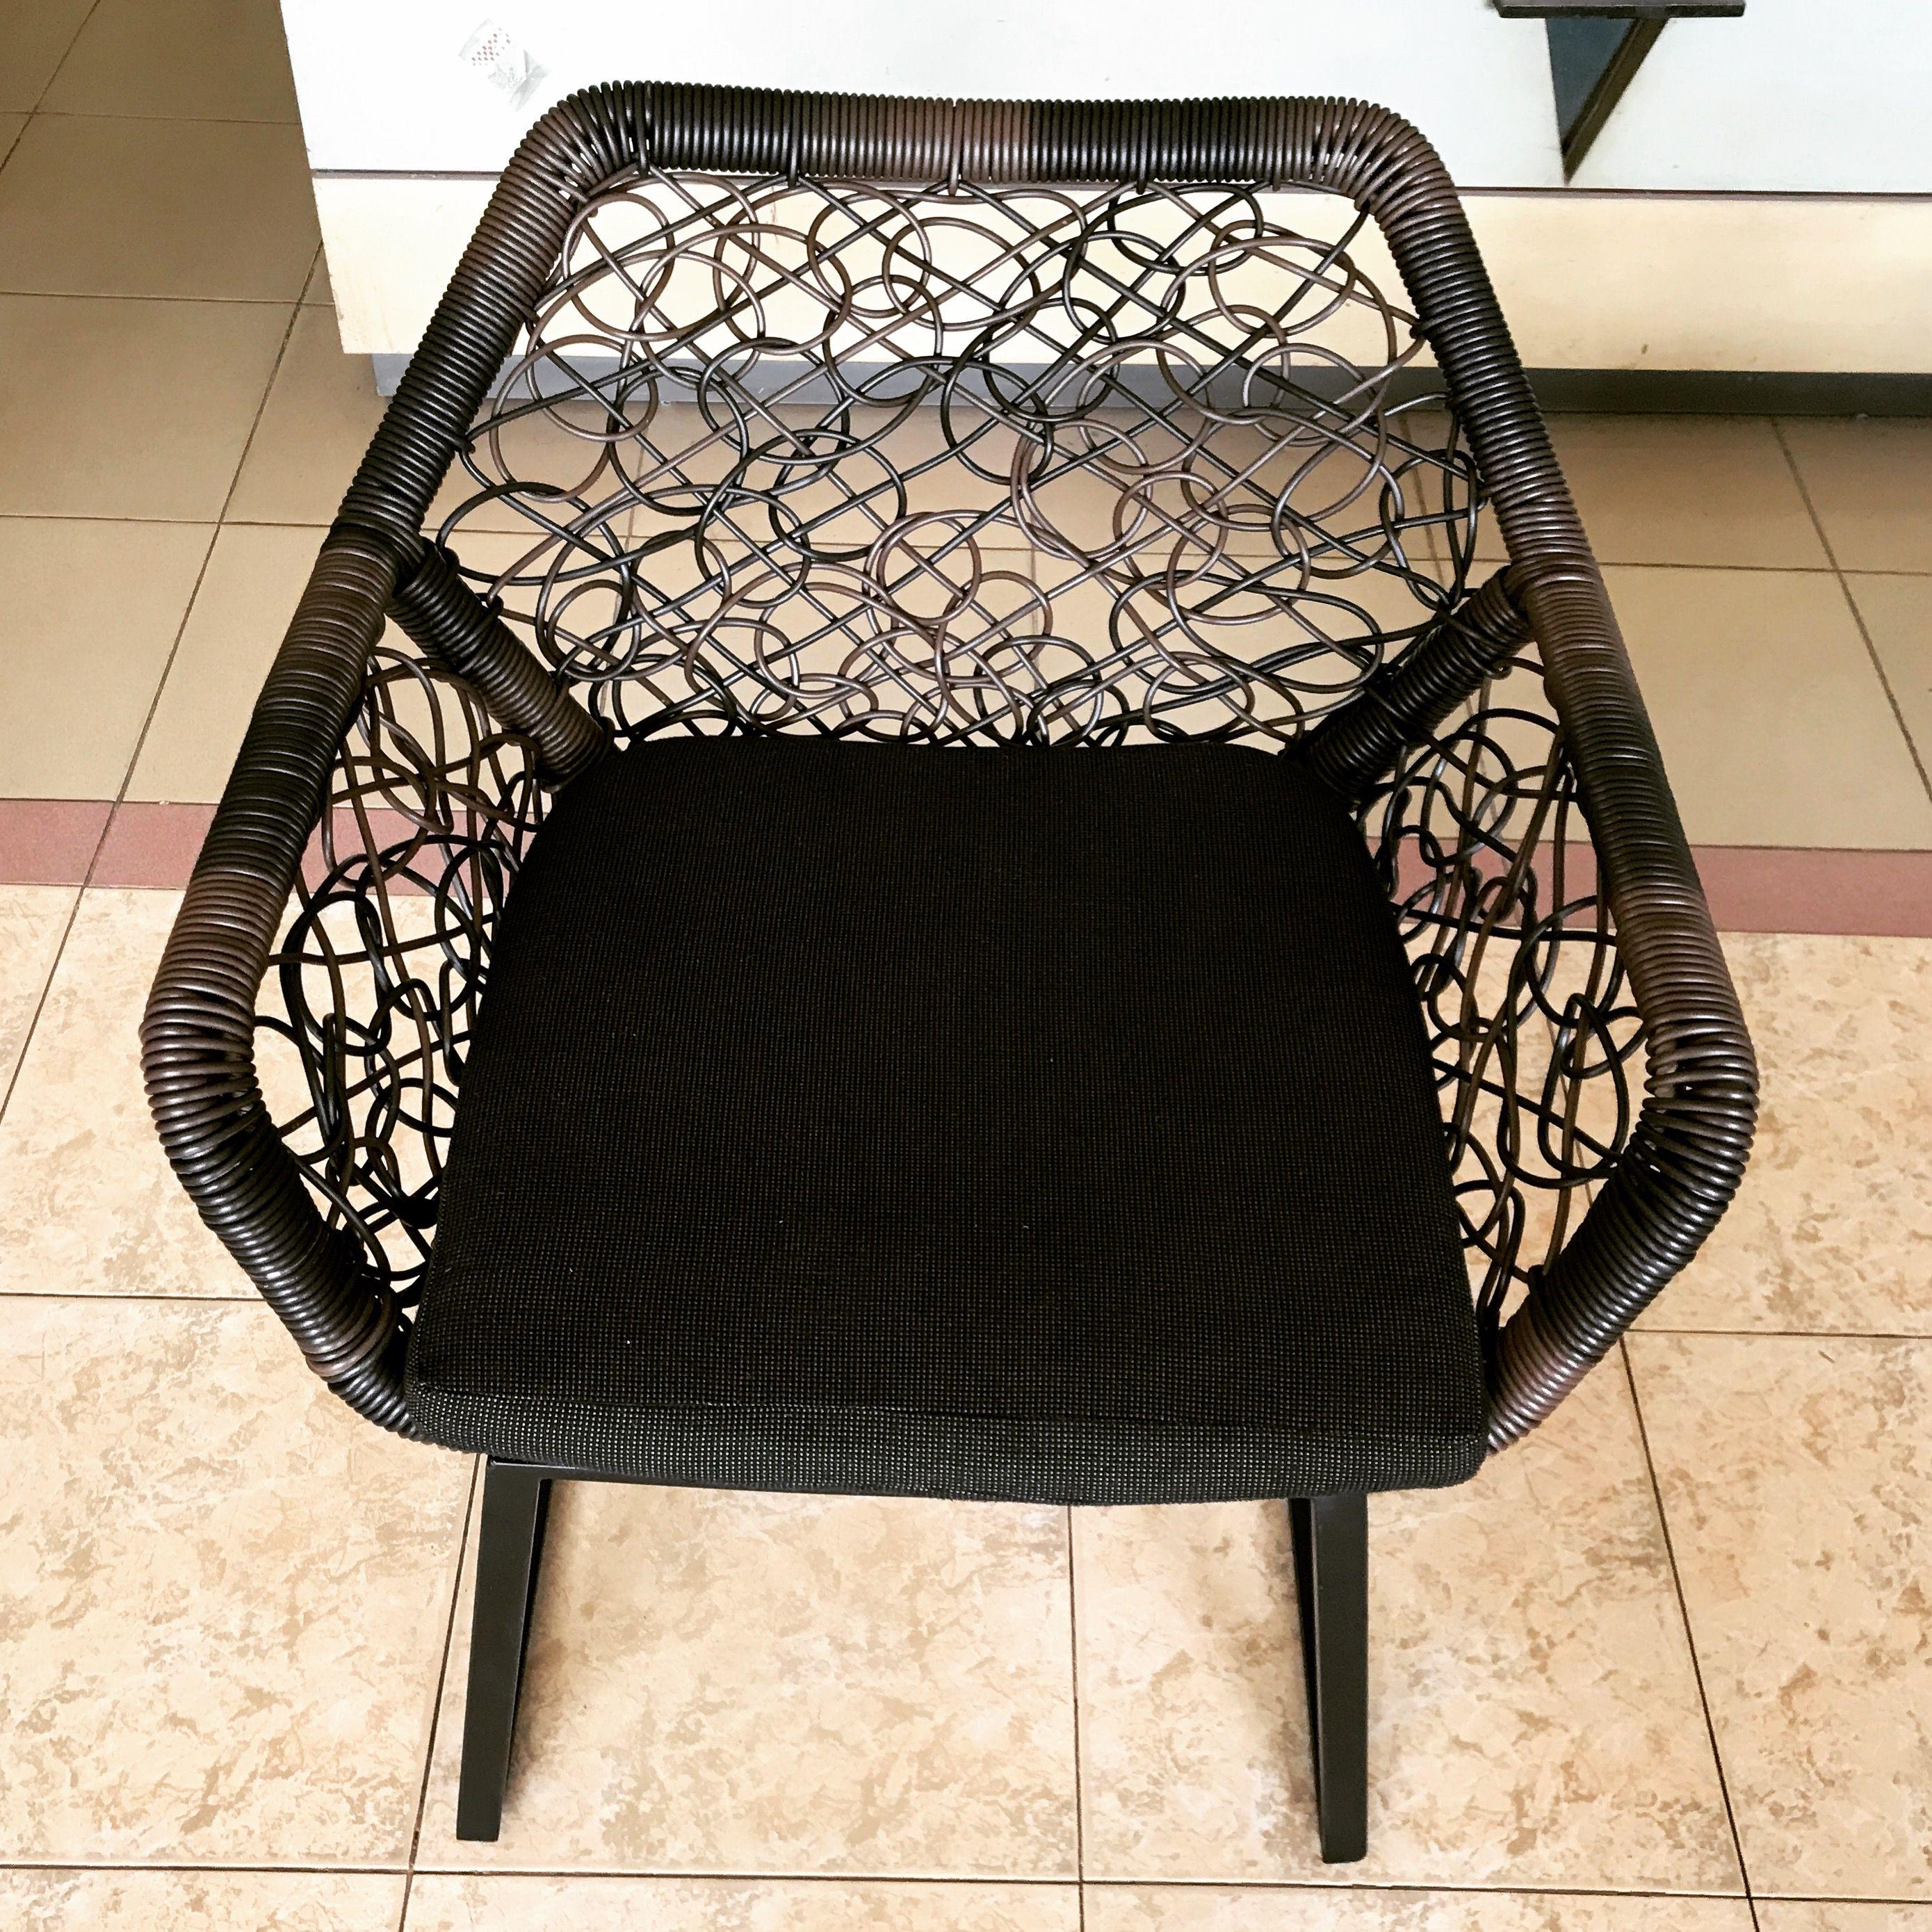 Starbuck Wicker Chair Made Vietnam From Mekongdecor